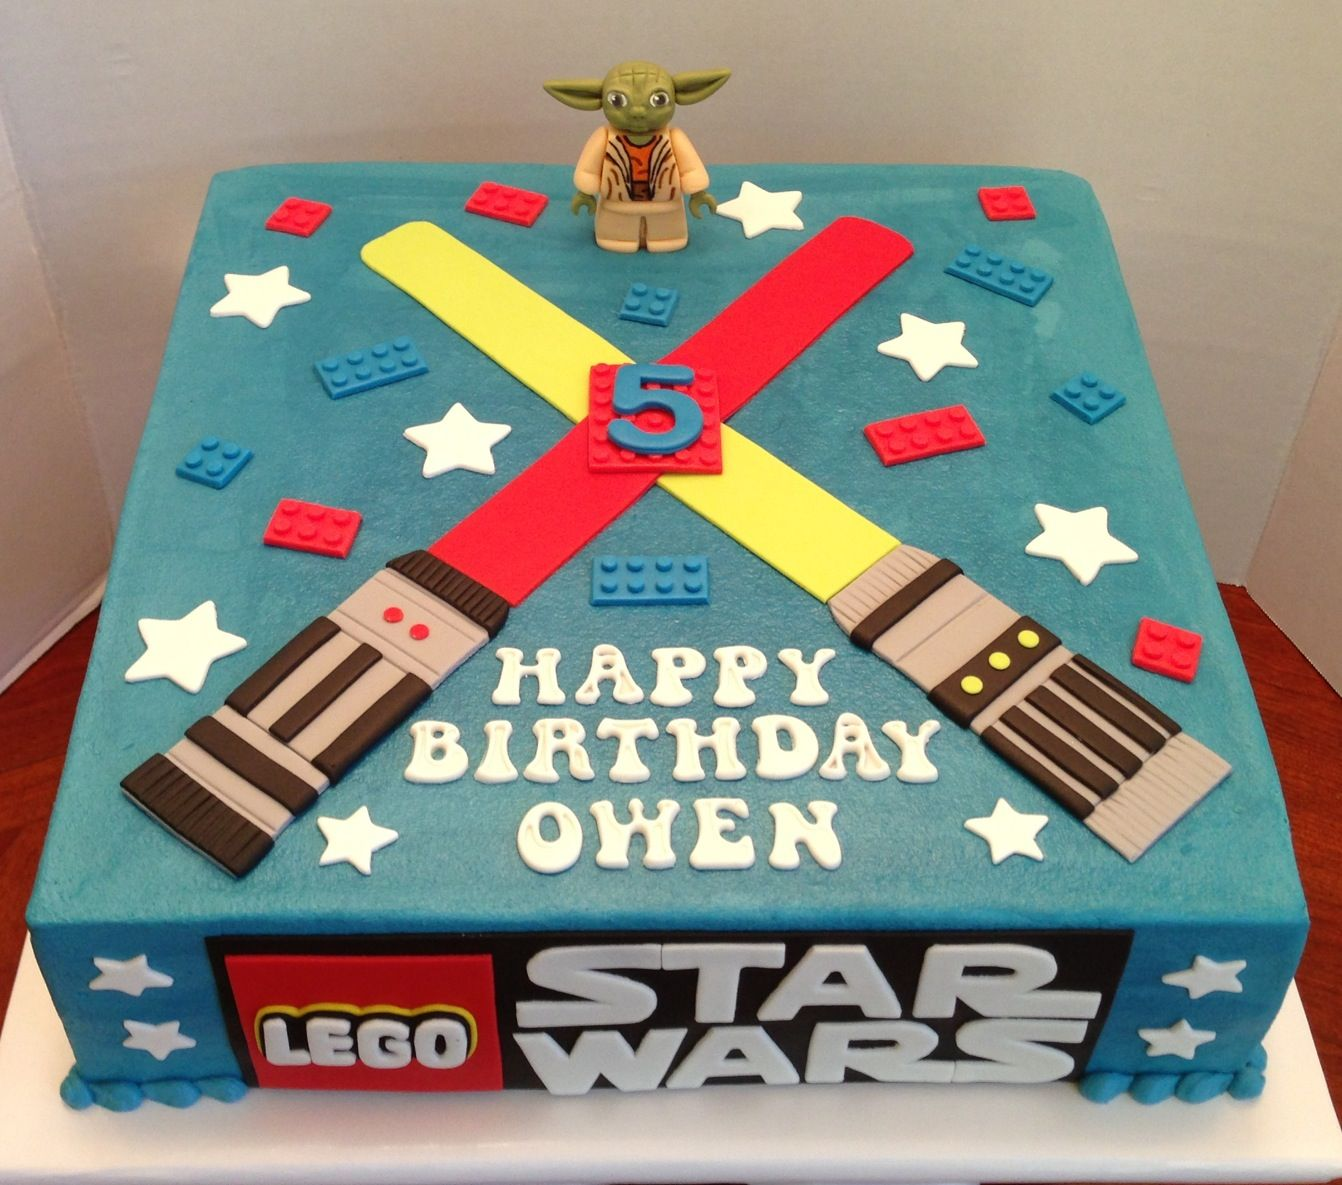 Lego Star Wars Cake With Yoda Mini Figure Original Design By